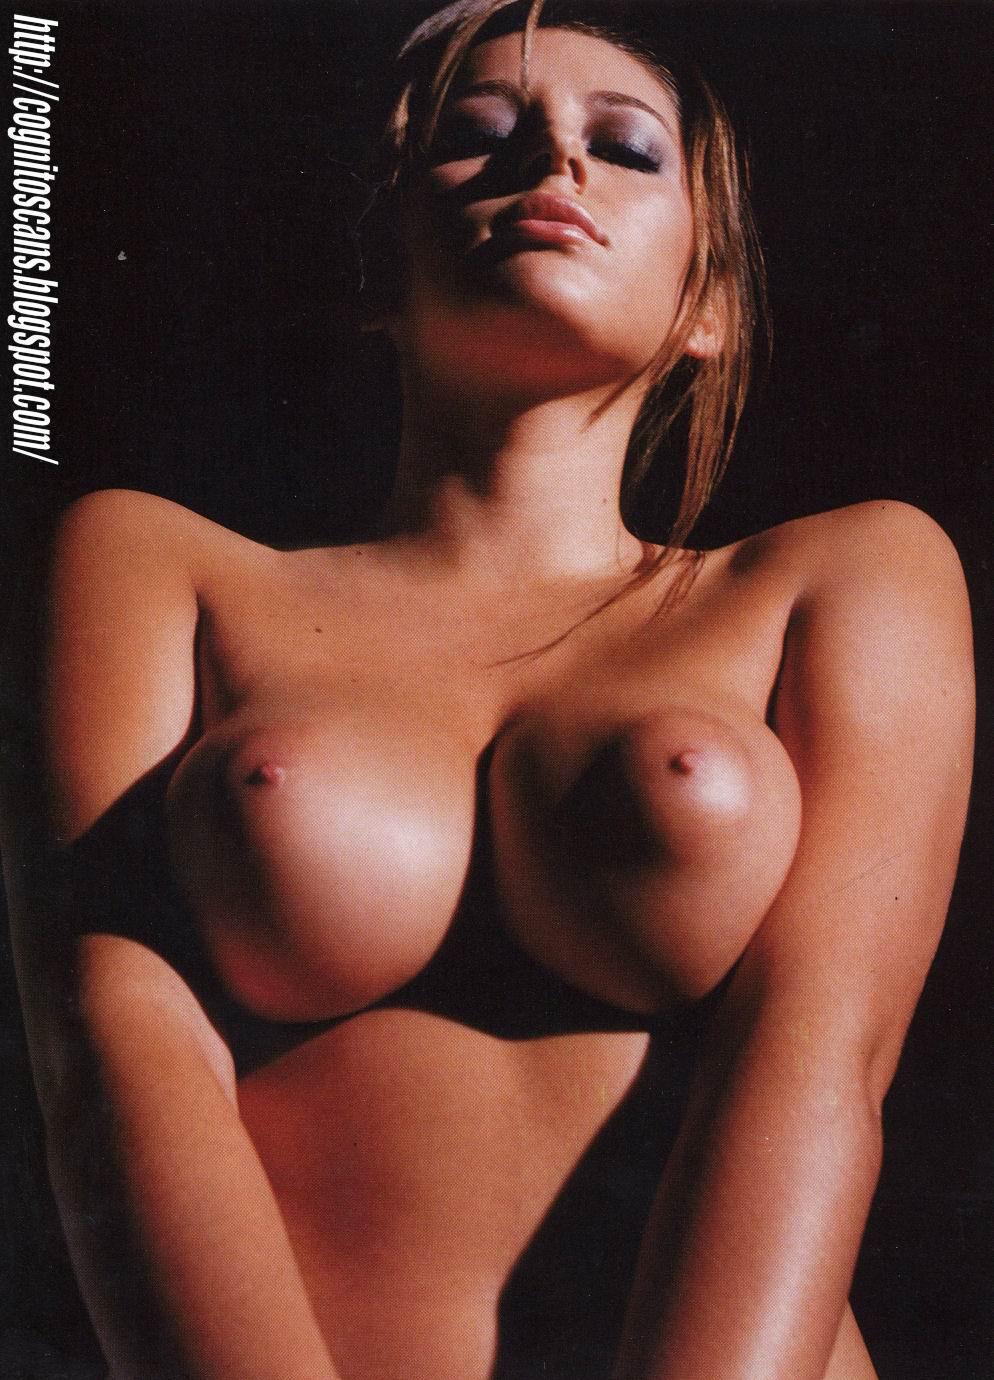 Keeley Hazell desnuda sin censura 1